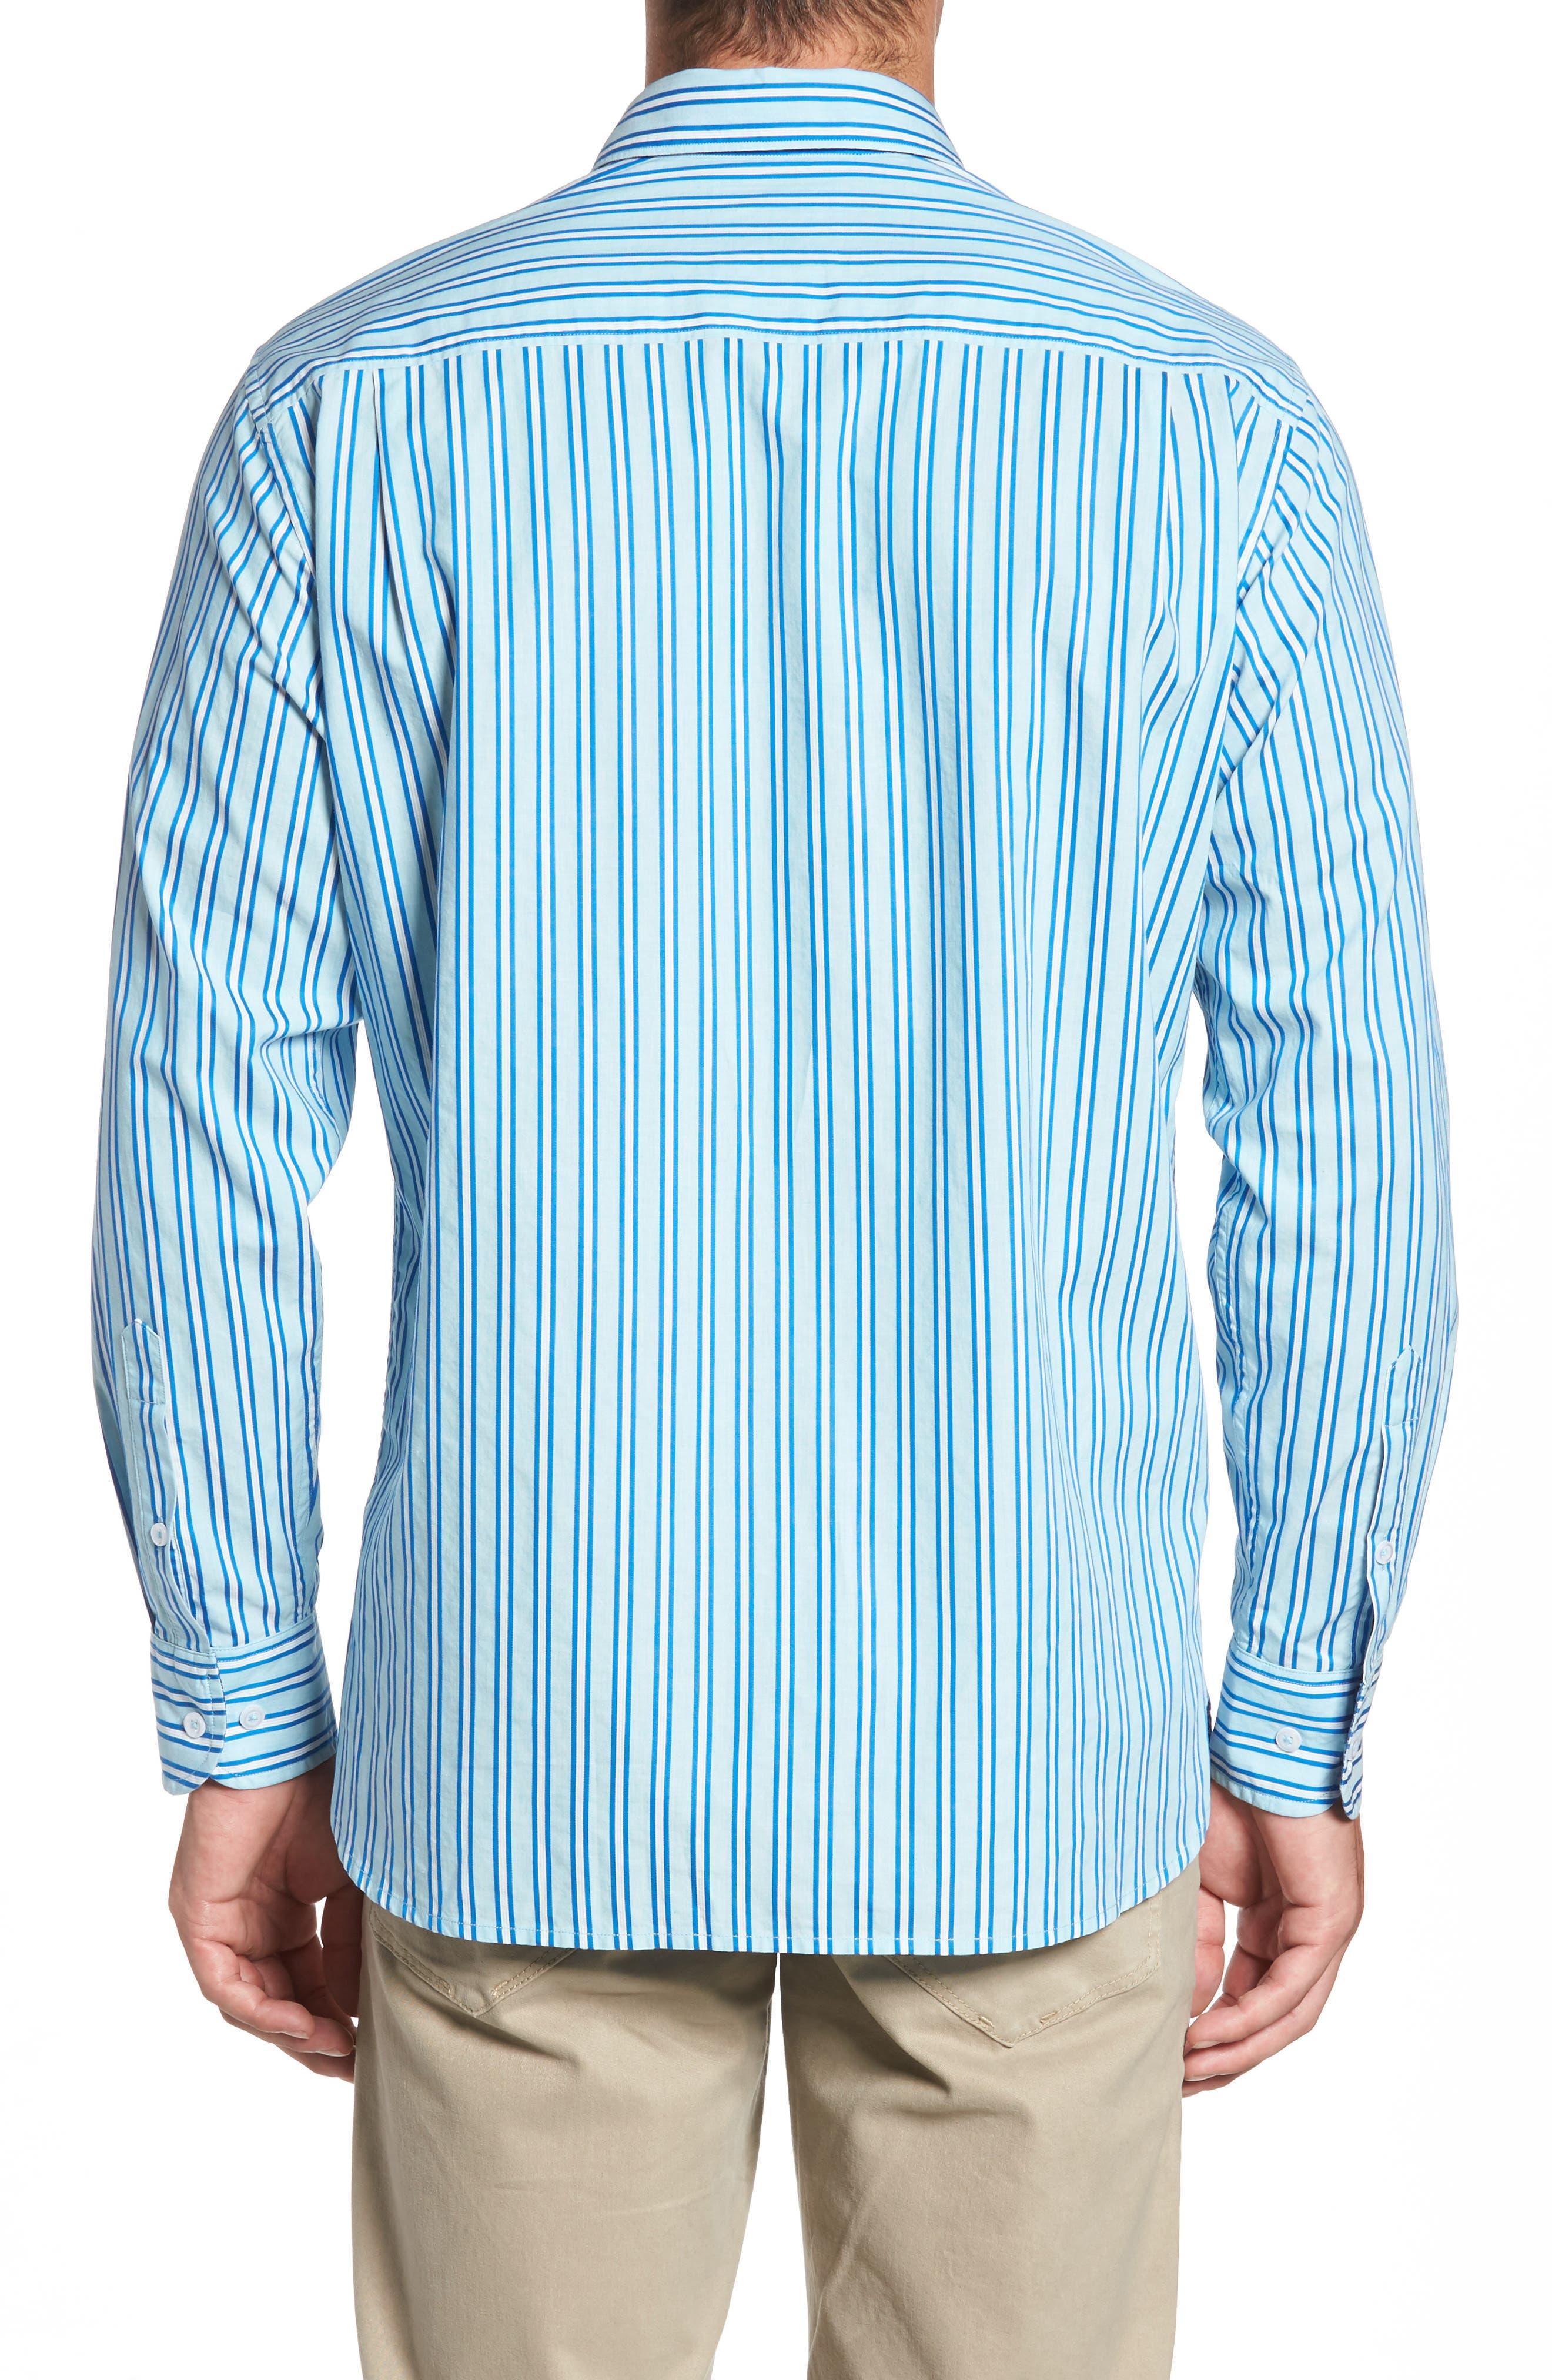 Surf the Line Stripe Sport Shirt,                             Alternate thumbnail 2, color,                             400